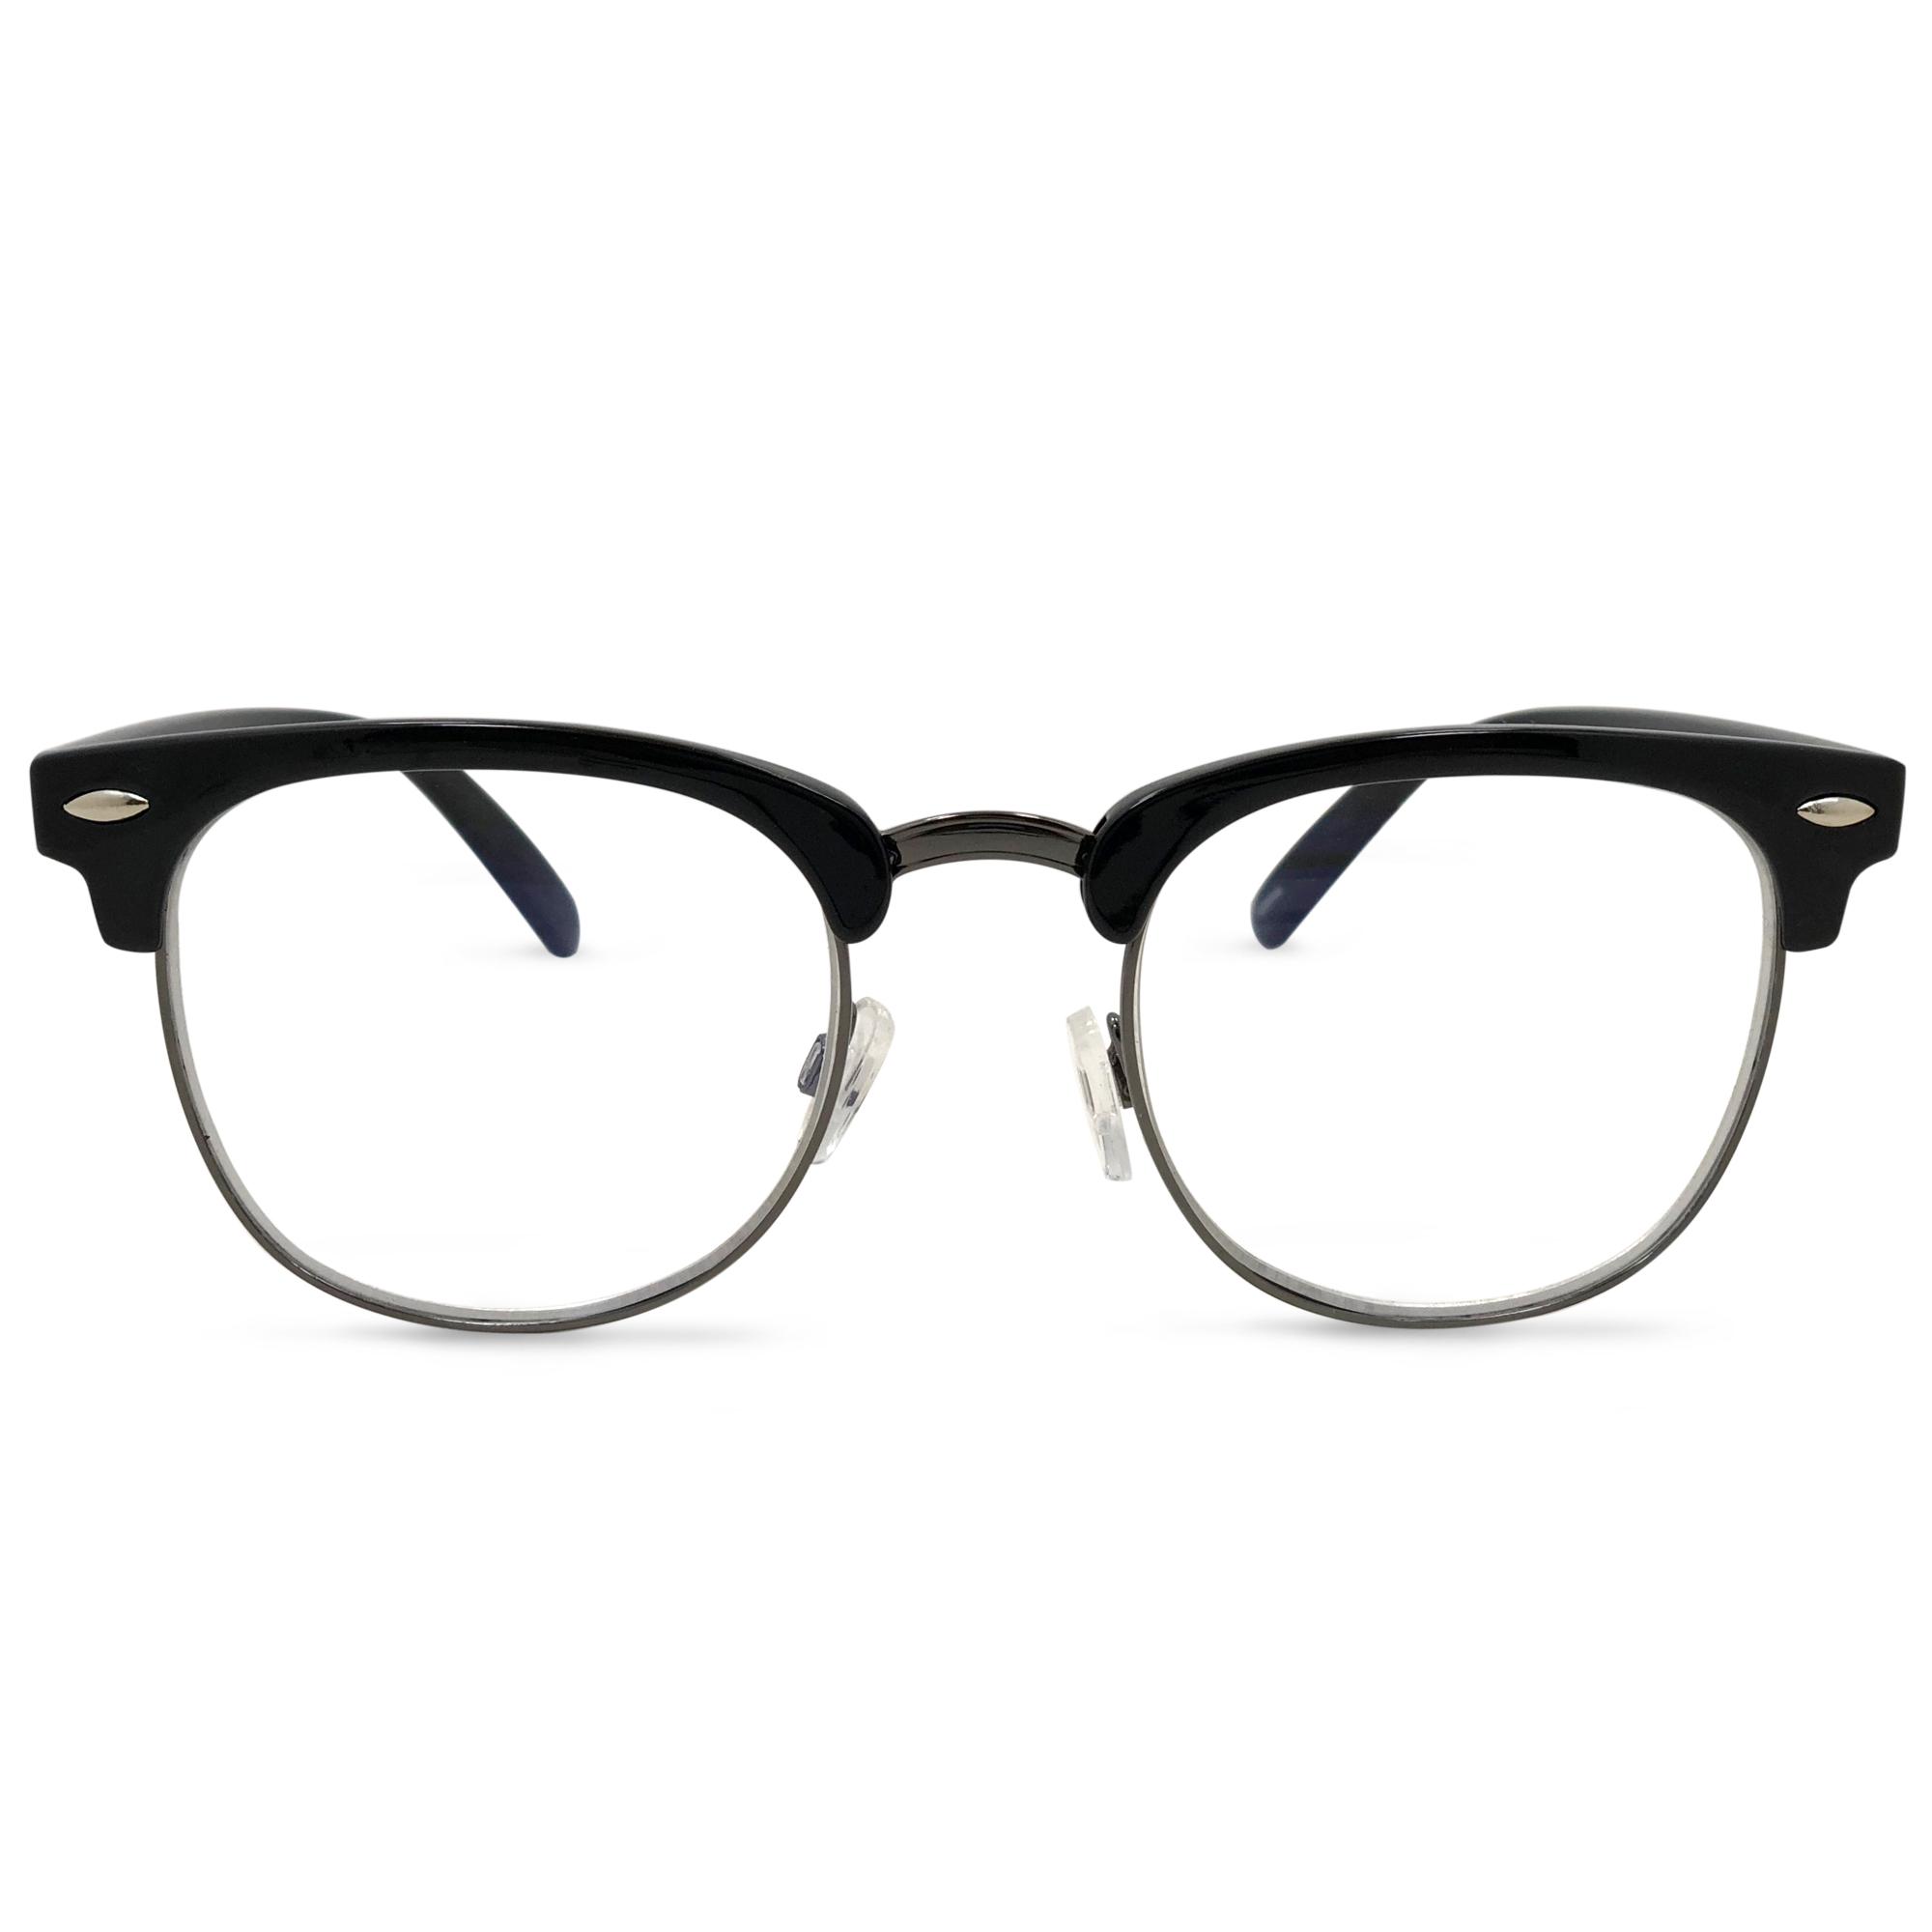 0a01256637 In Style Eyes Sellecks Progressive No Line Bifocal Reading Glasses ...